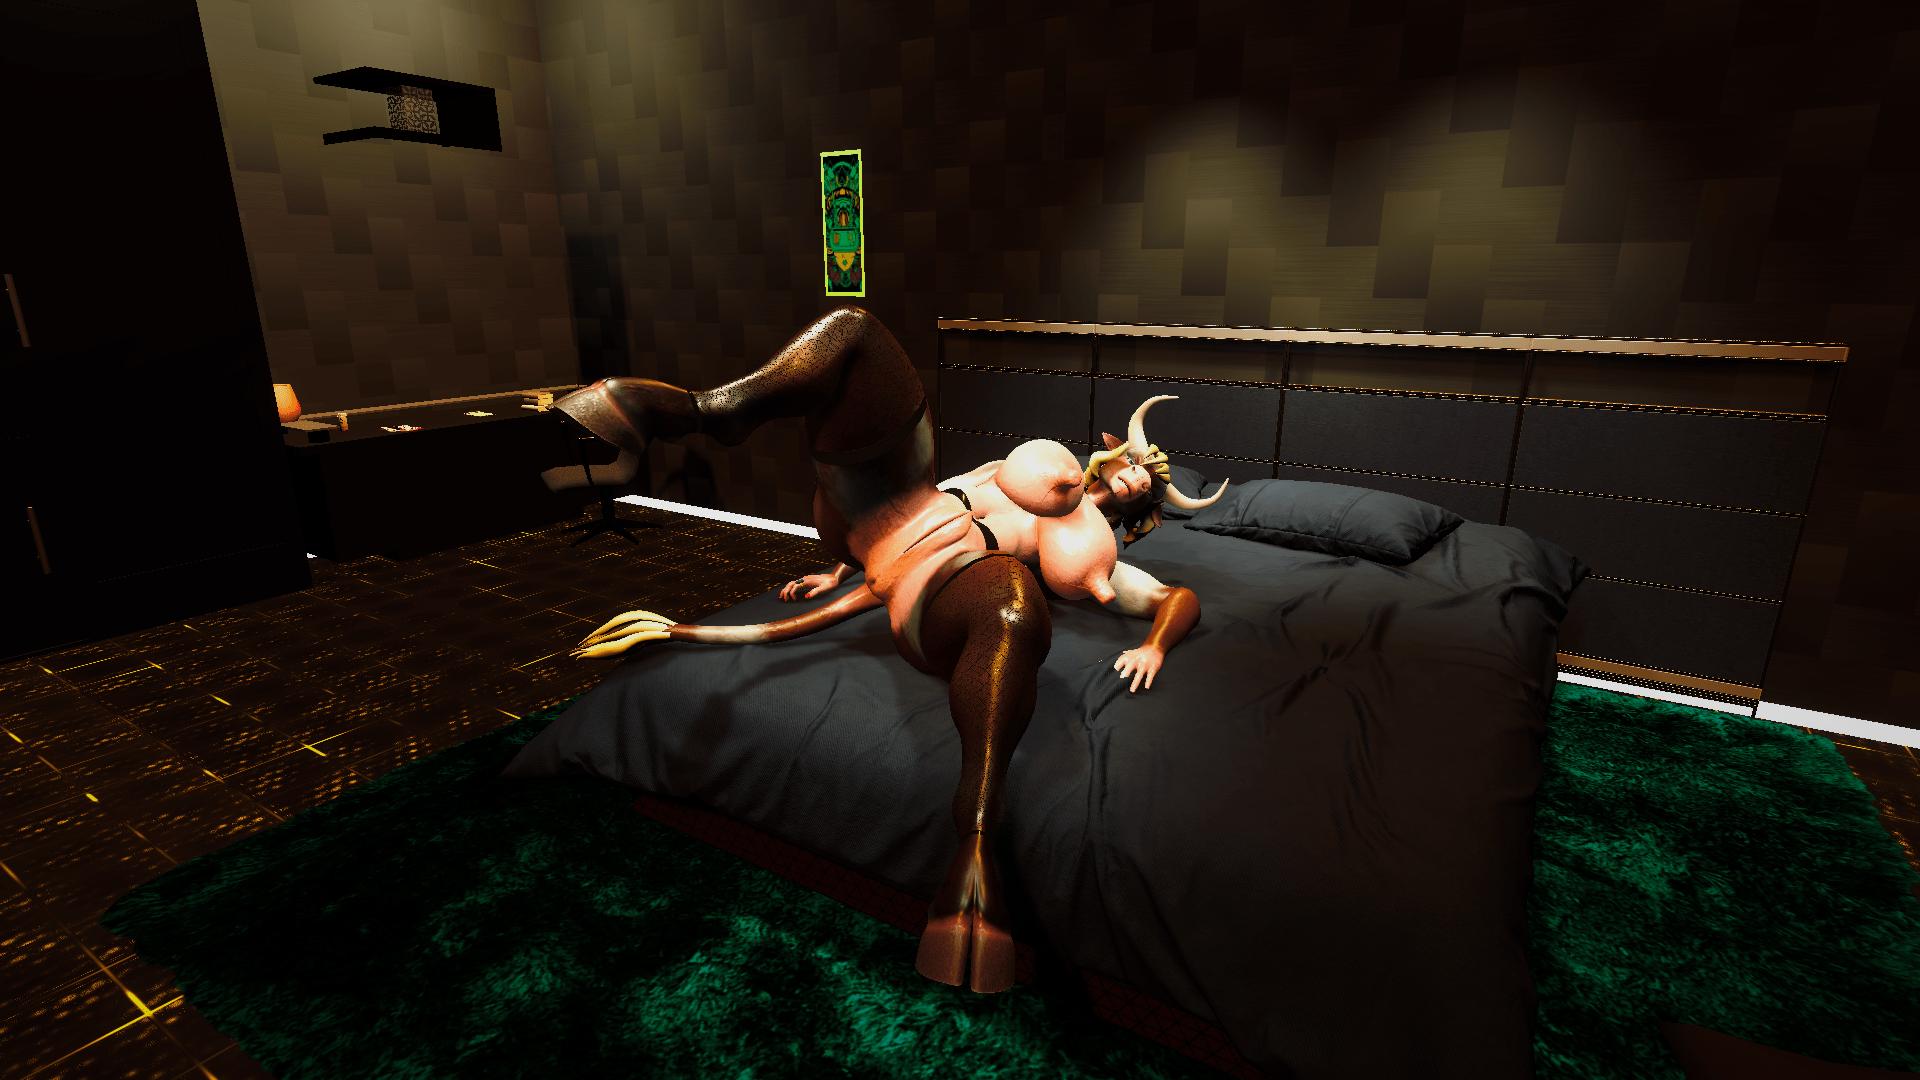 8.project elera hotel elera vr porn game